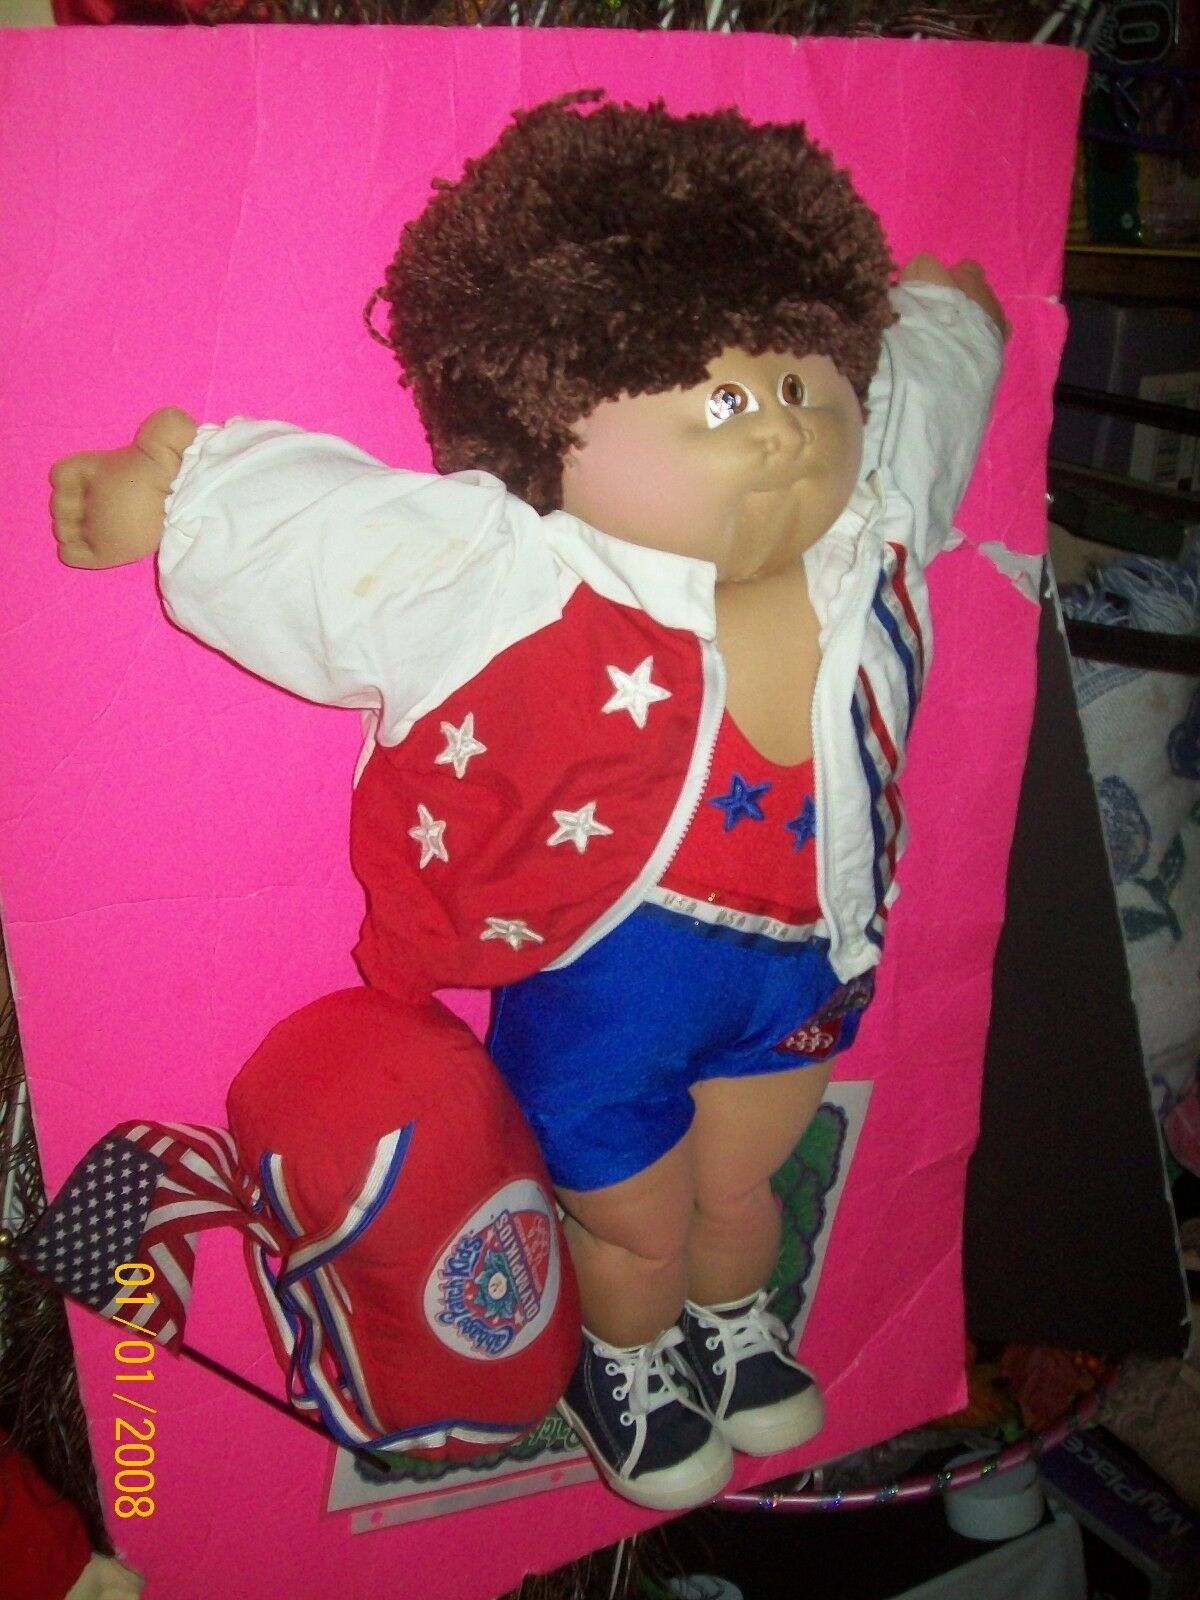 Escultura blanda niños luchador olímpico Muñeca Cabbage Patch Niño Raro firmados